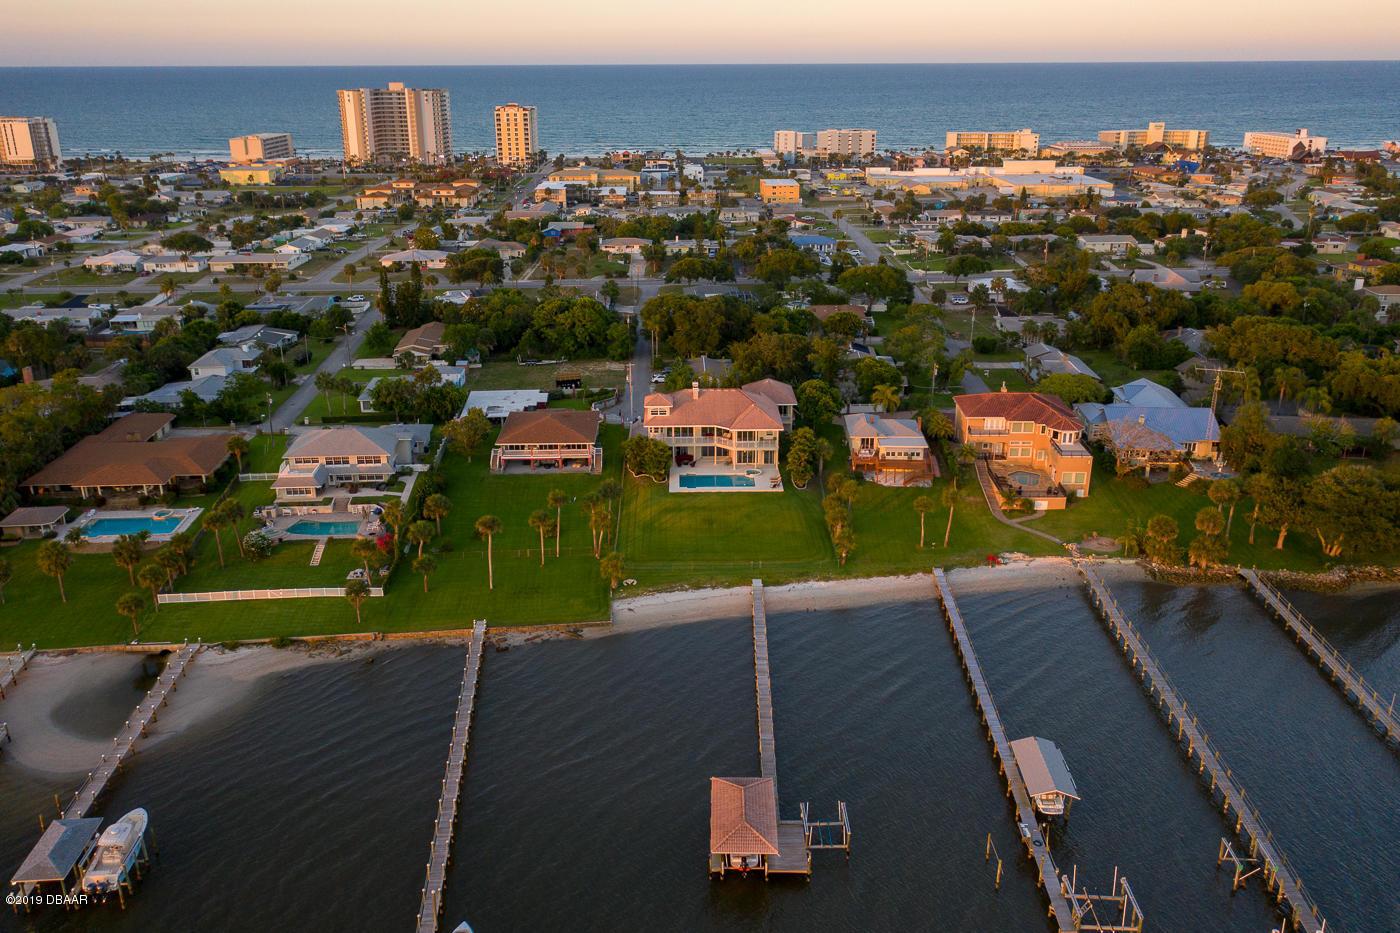 5 Widmer Daytona Beach - 97